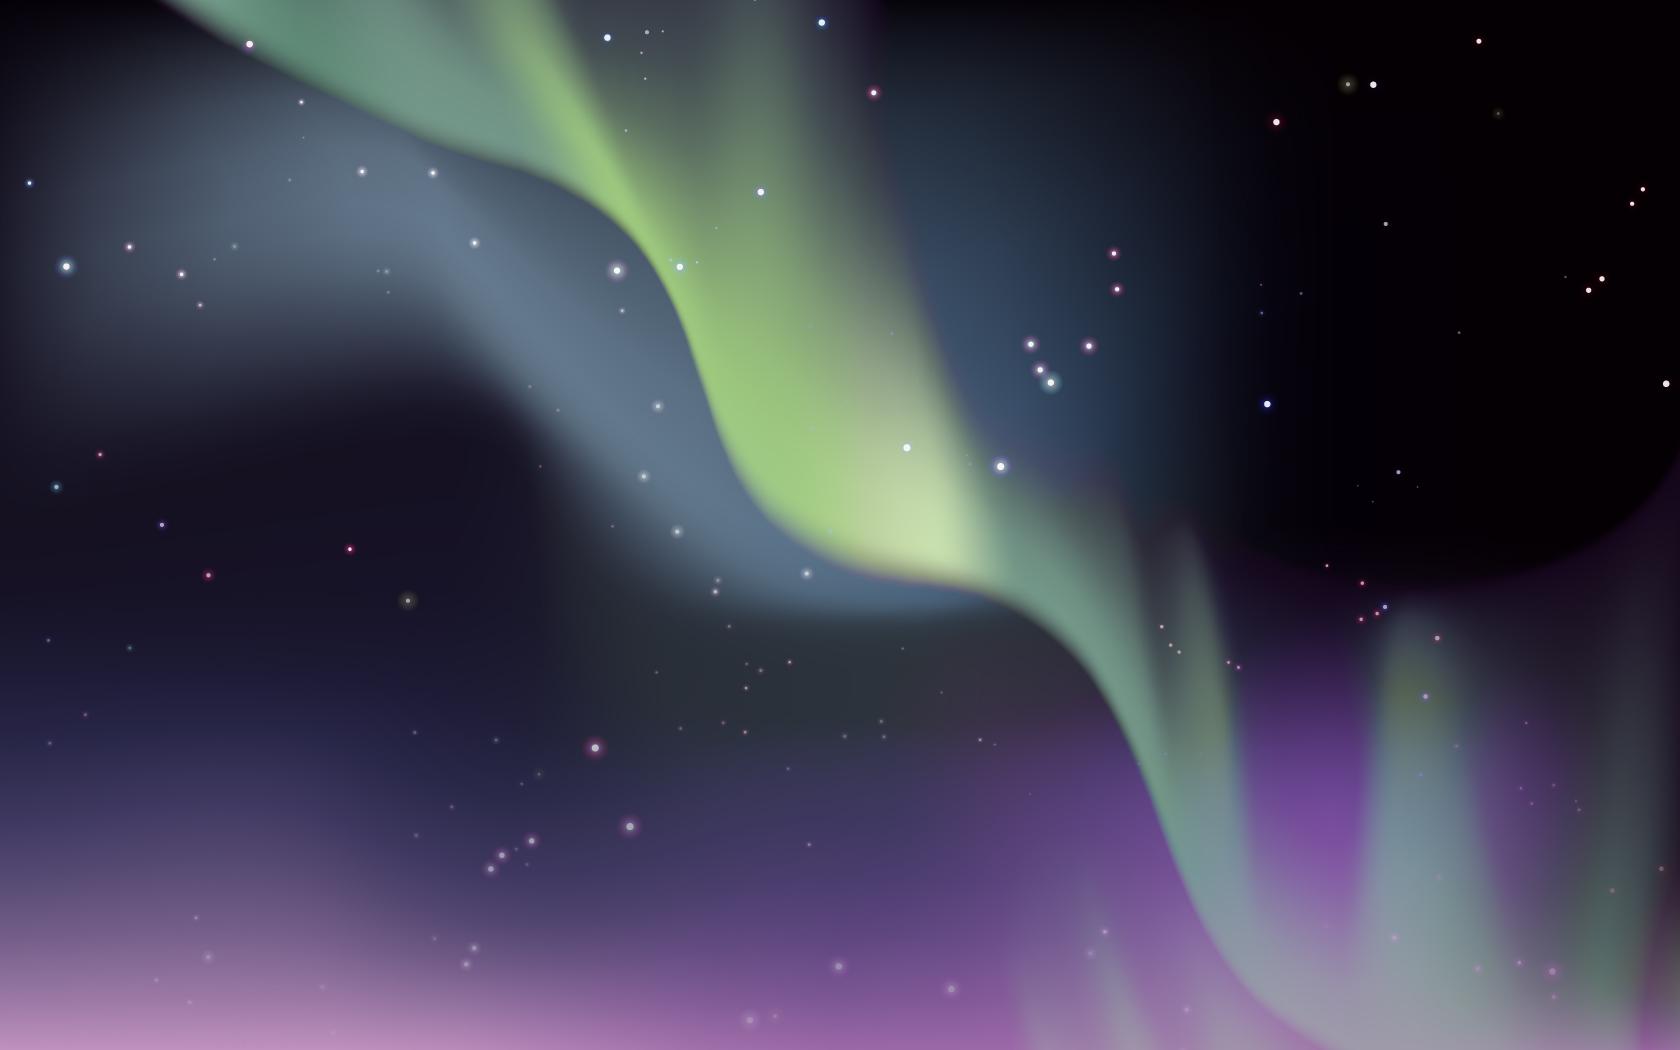 1680x1050 Make An Aurora Borealis Design In Illustrator